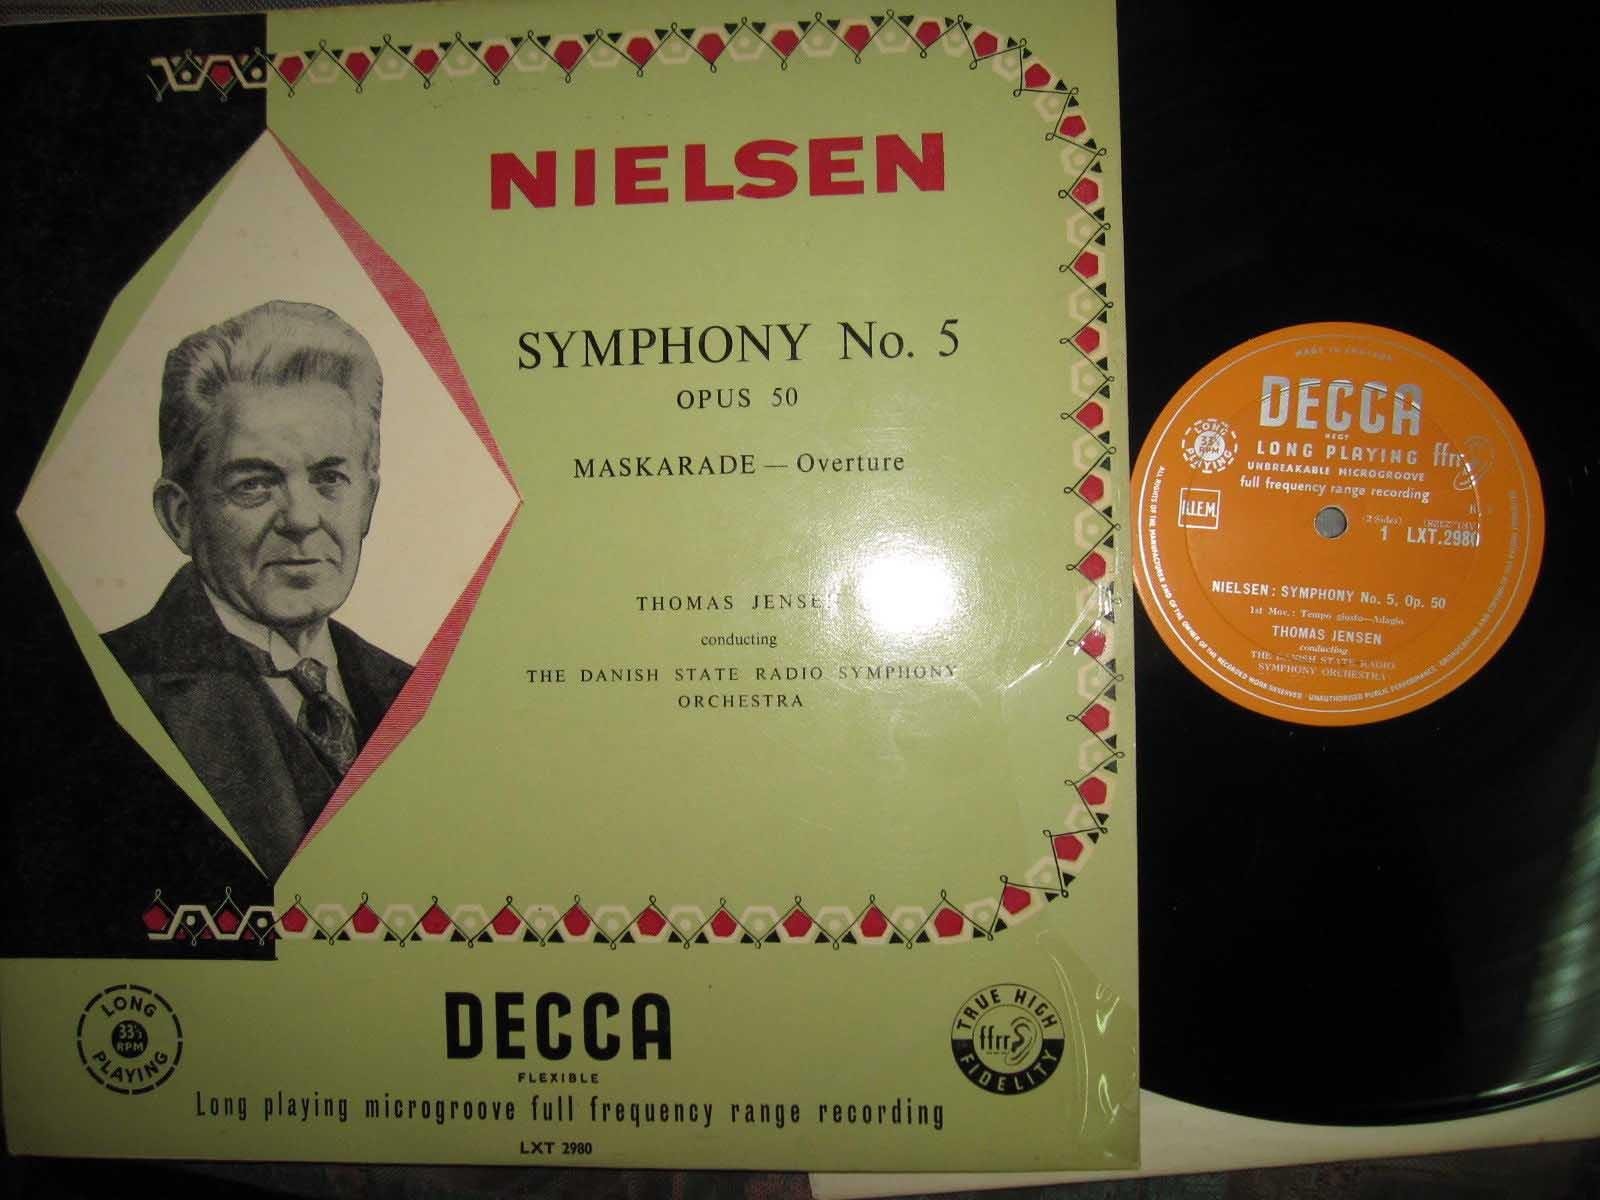 NIELSEN - THOMAS JENSEN - Symphony no. 5 Maskarade Overture